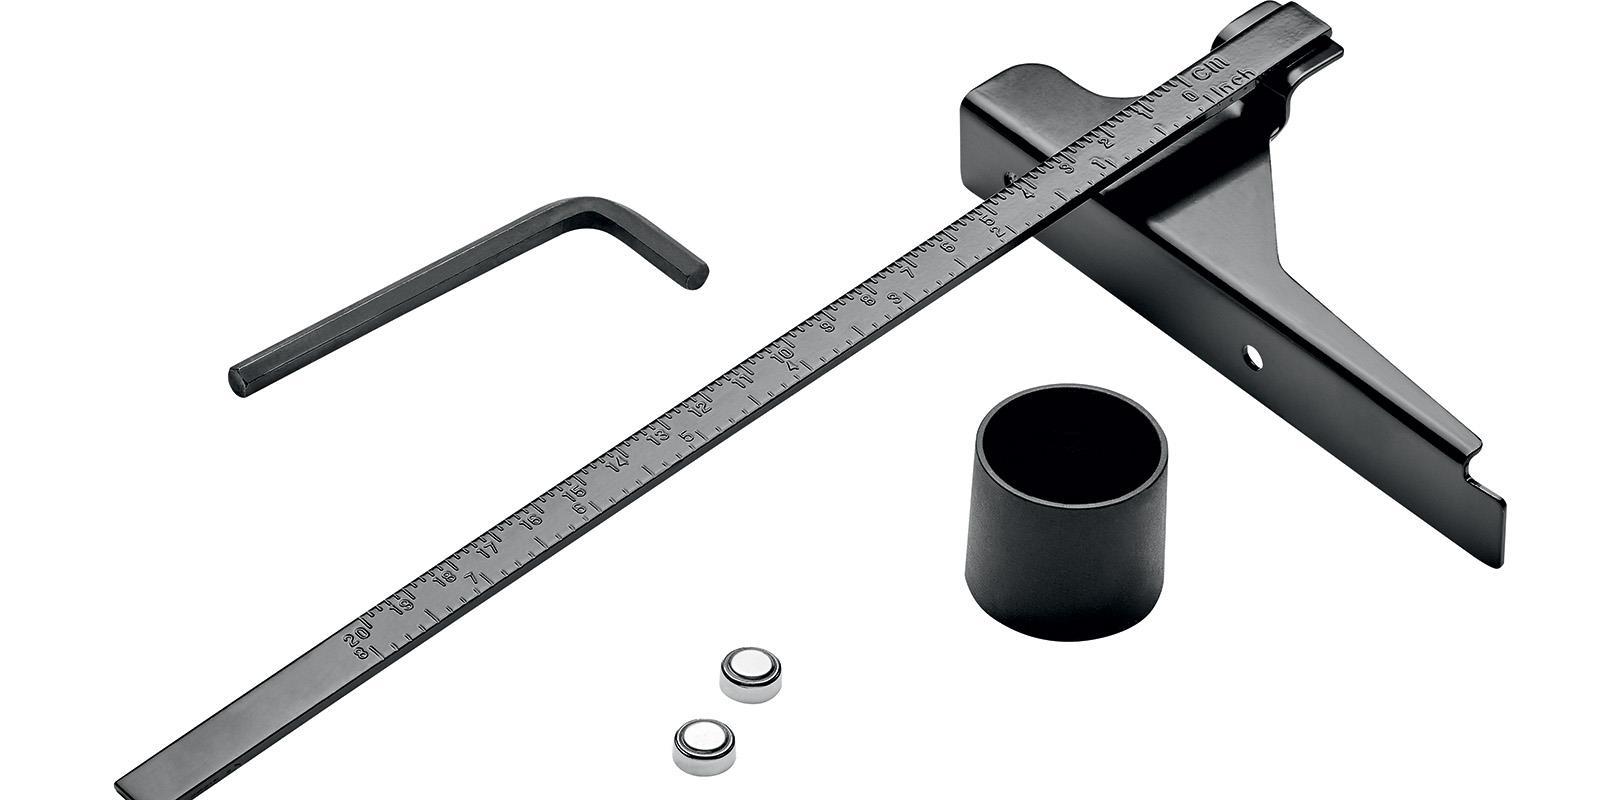 parkside handkreiss ge pkhs 1350 c2 kreiss ge s ge s geblatt b ware ebay. Black Bedroom Furniture Sets. Home Design Ideas